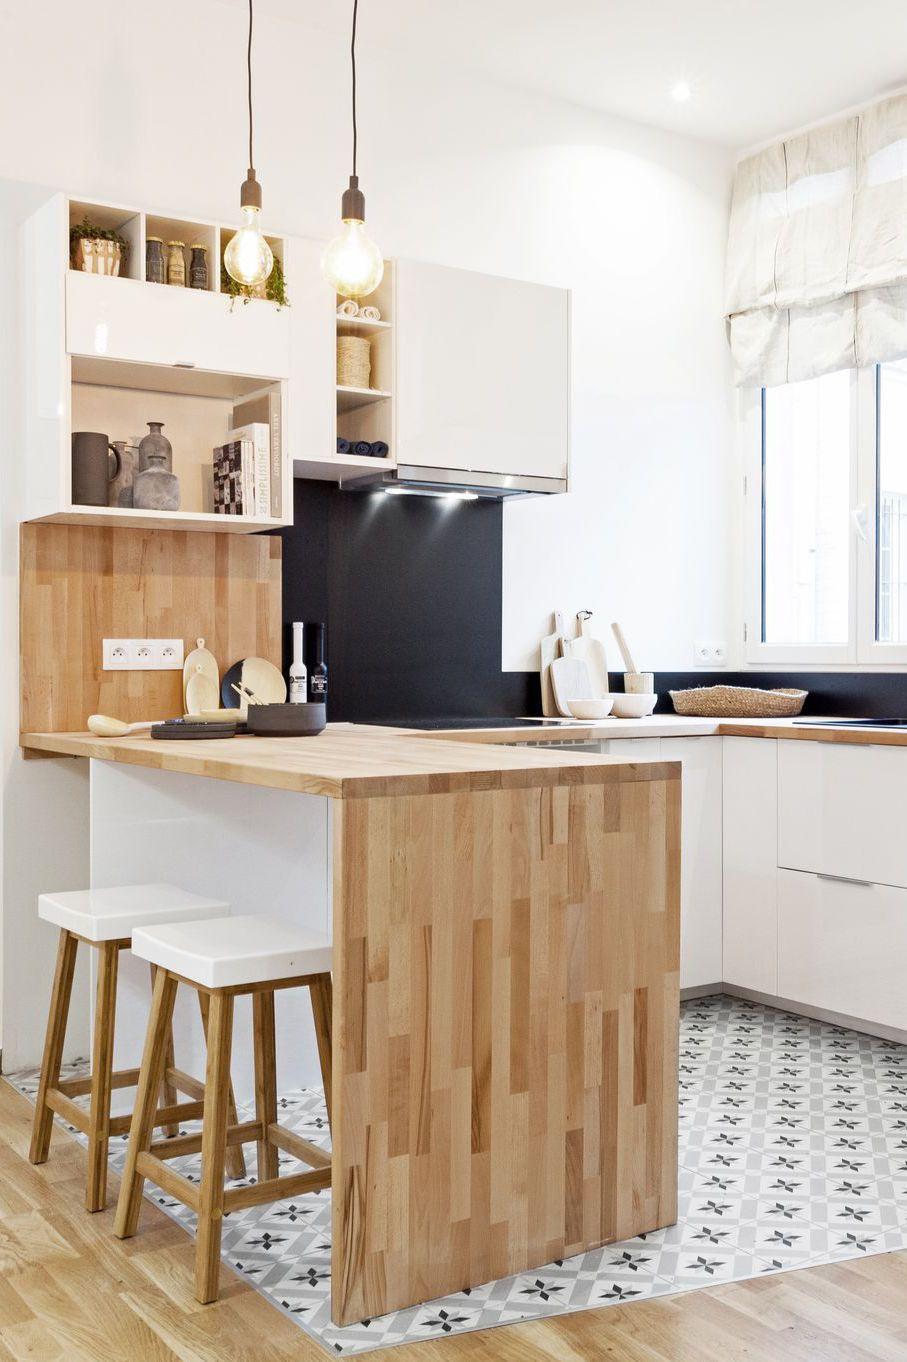 Lampe cuisine inspirations pour trouver son style kitchens